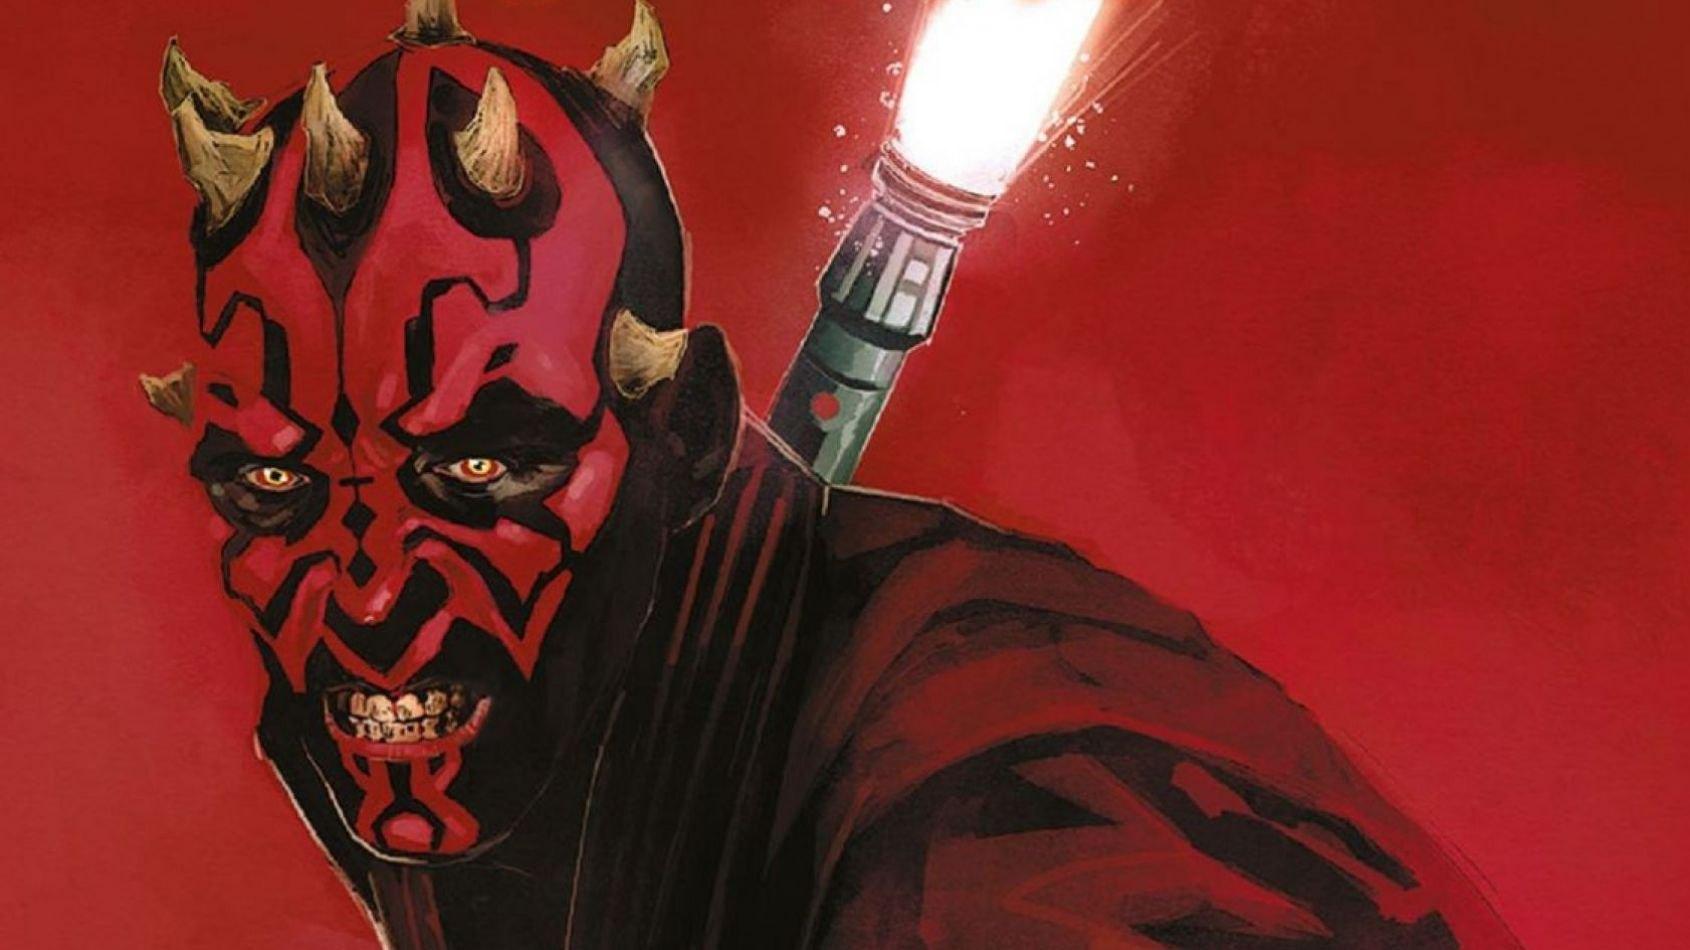 Panini : Sortie de Dark Maul et du magazine de comics Star Wars 003